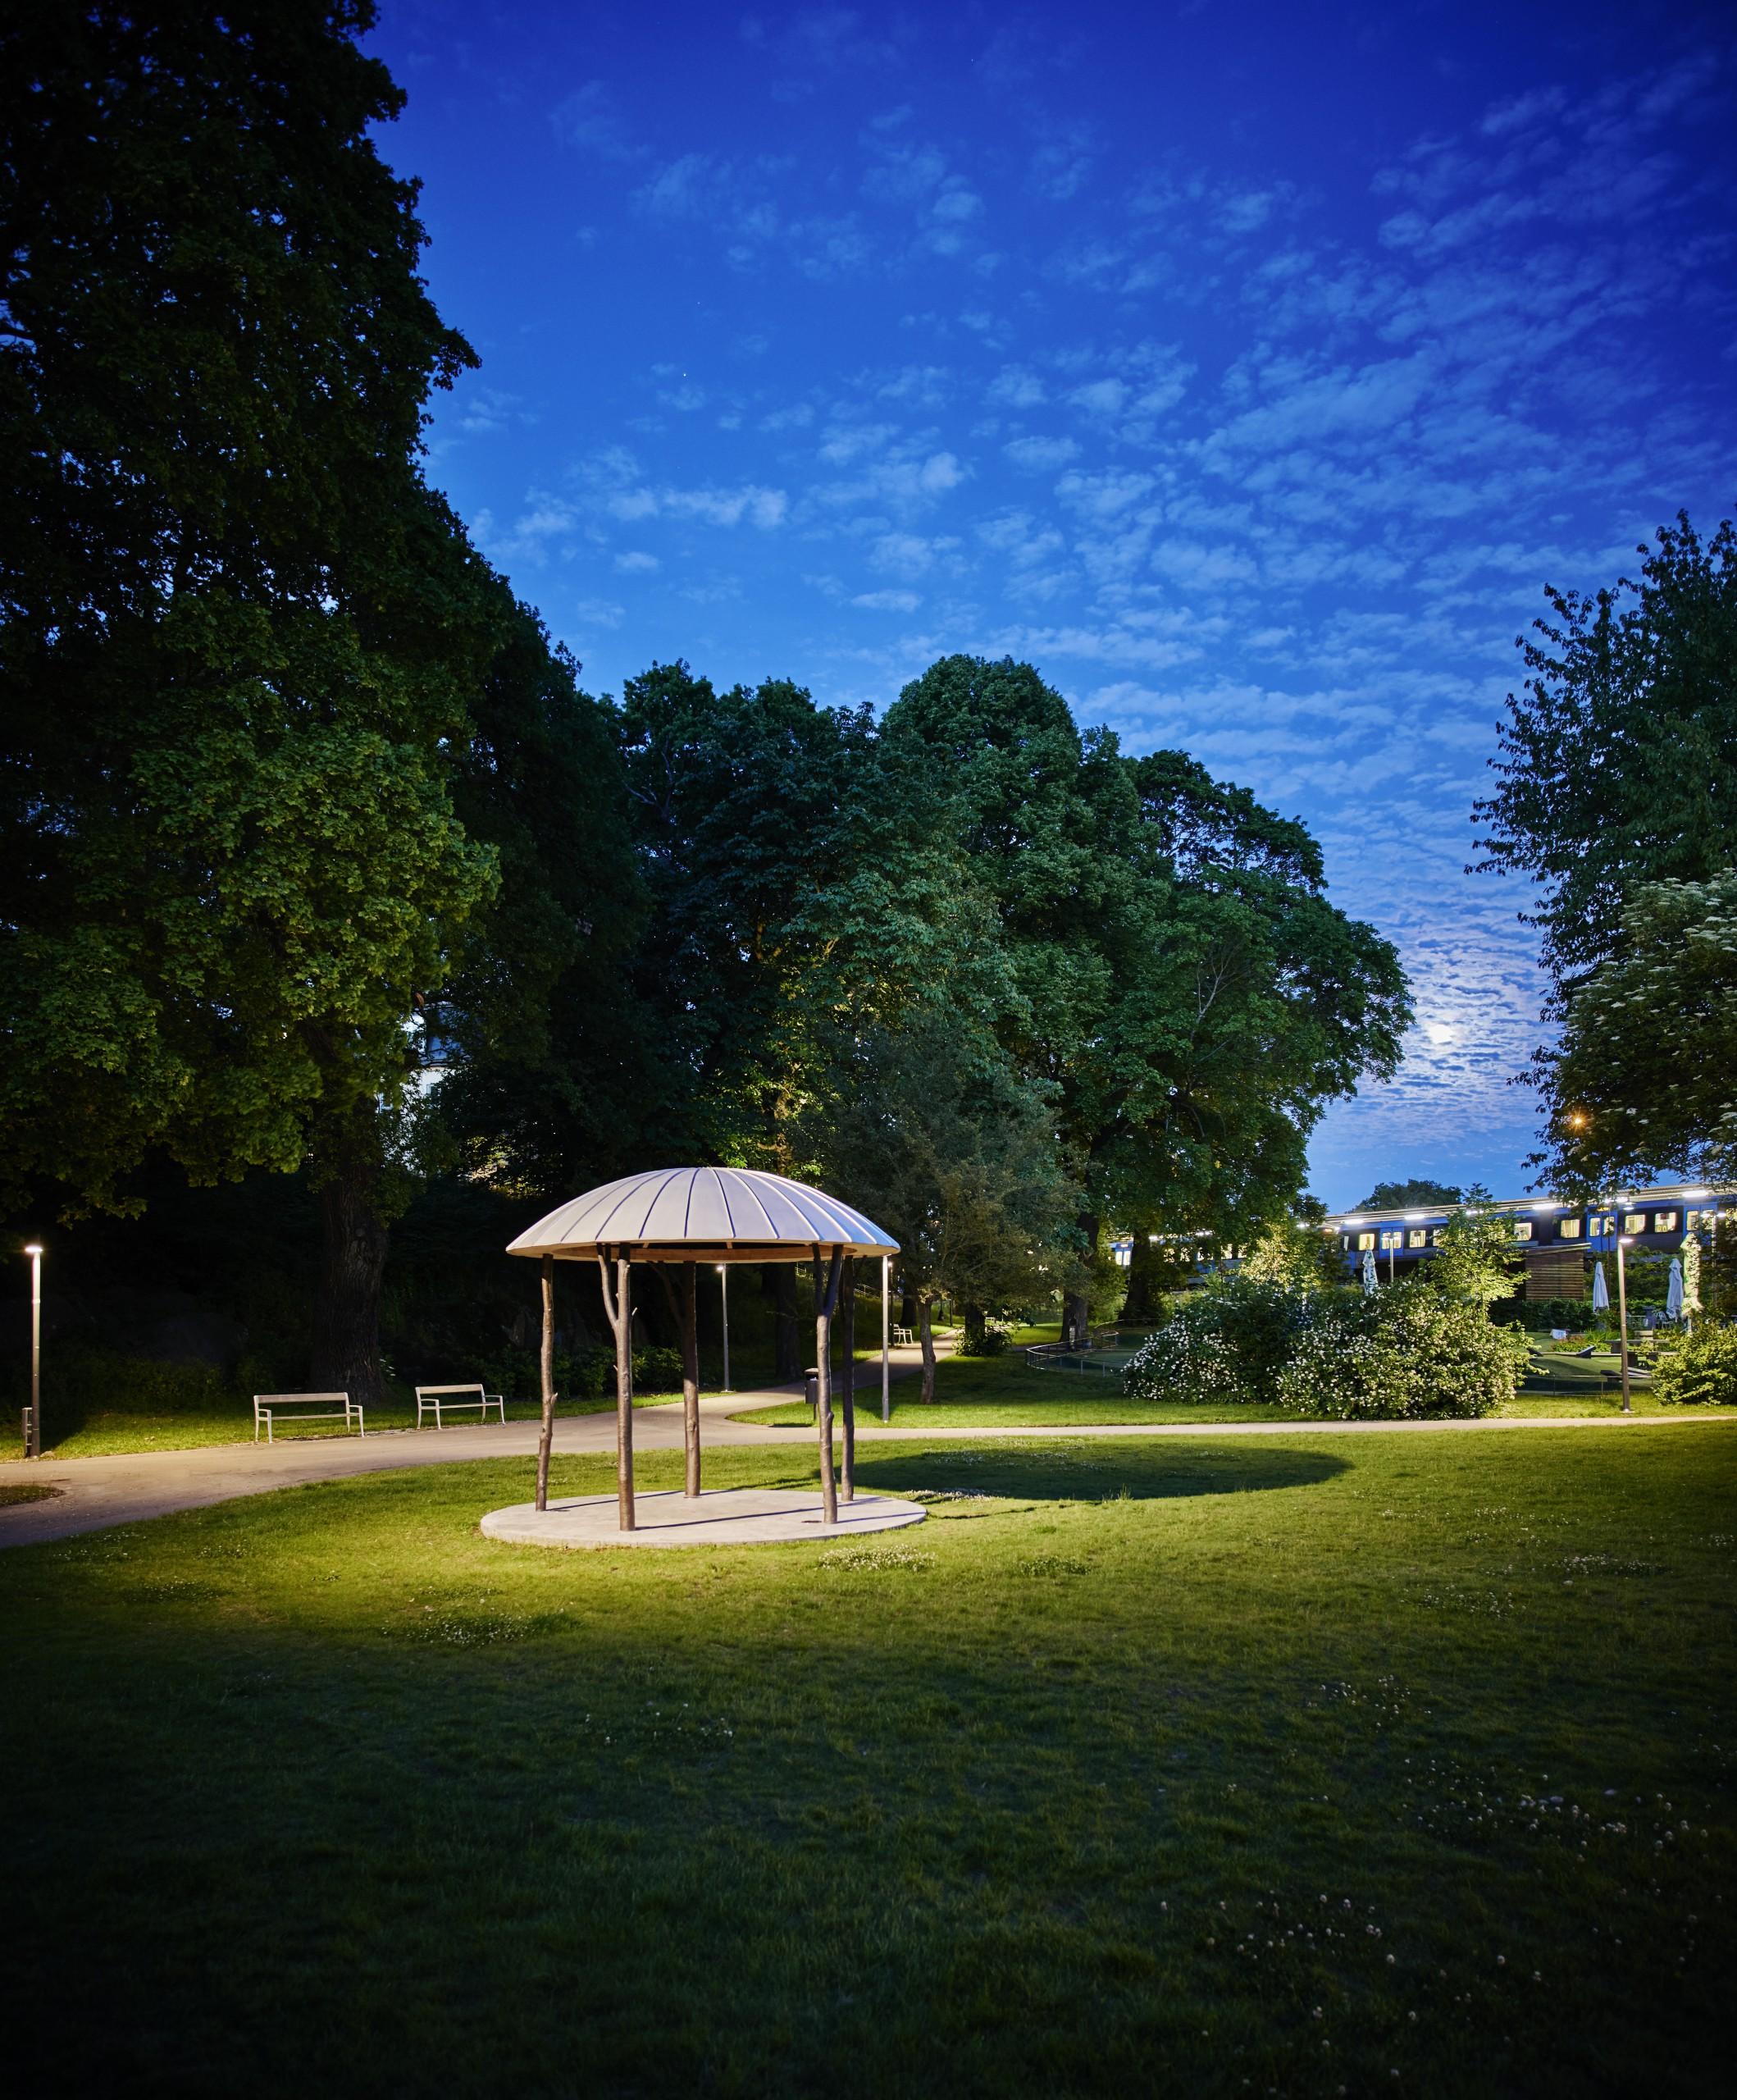 park at night